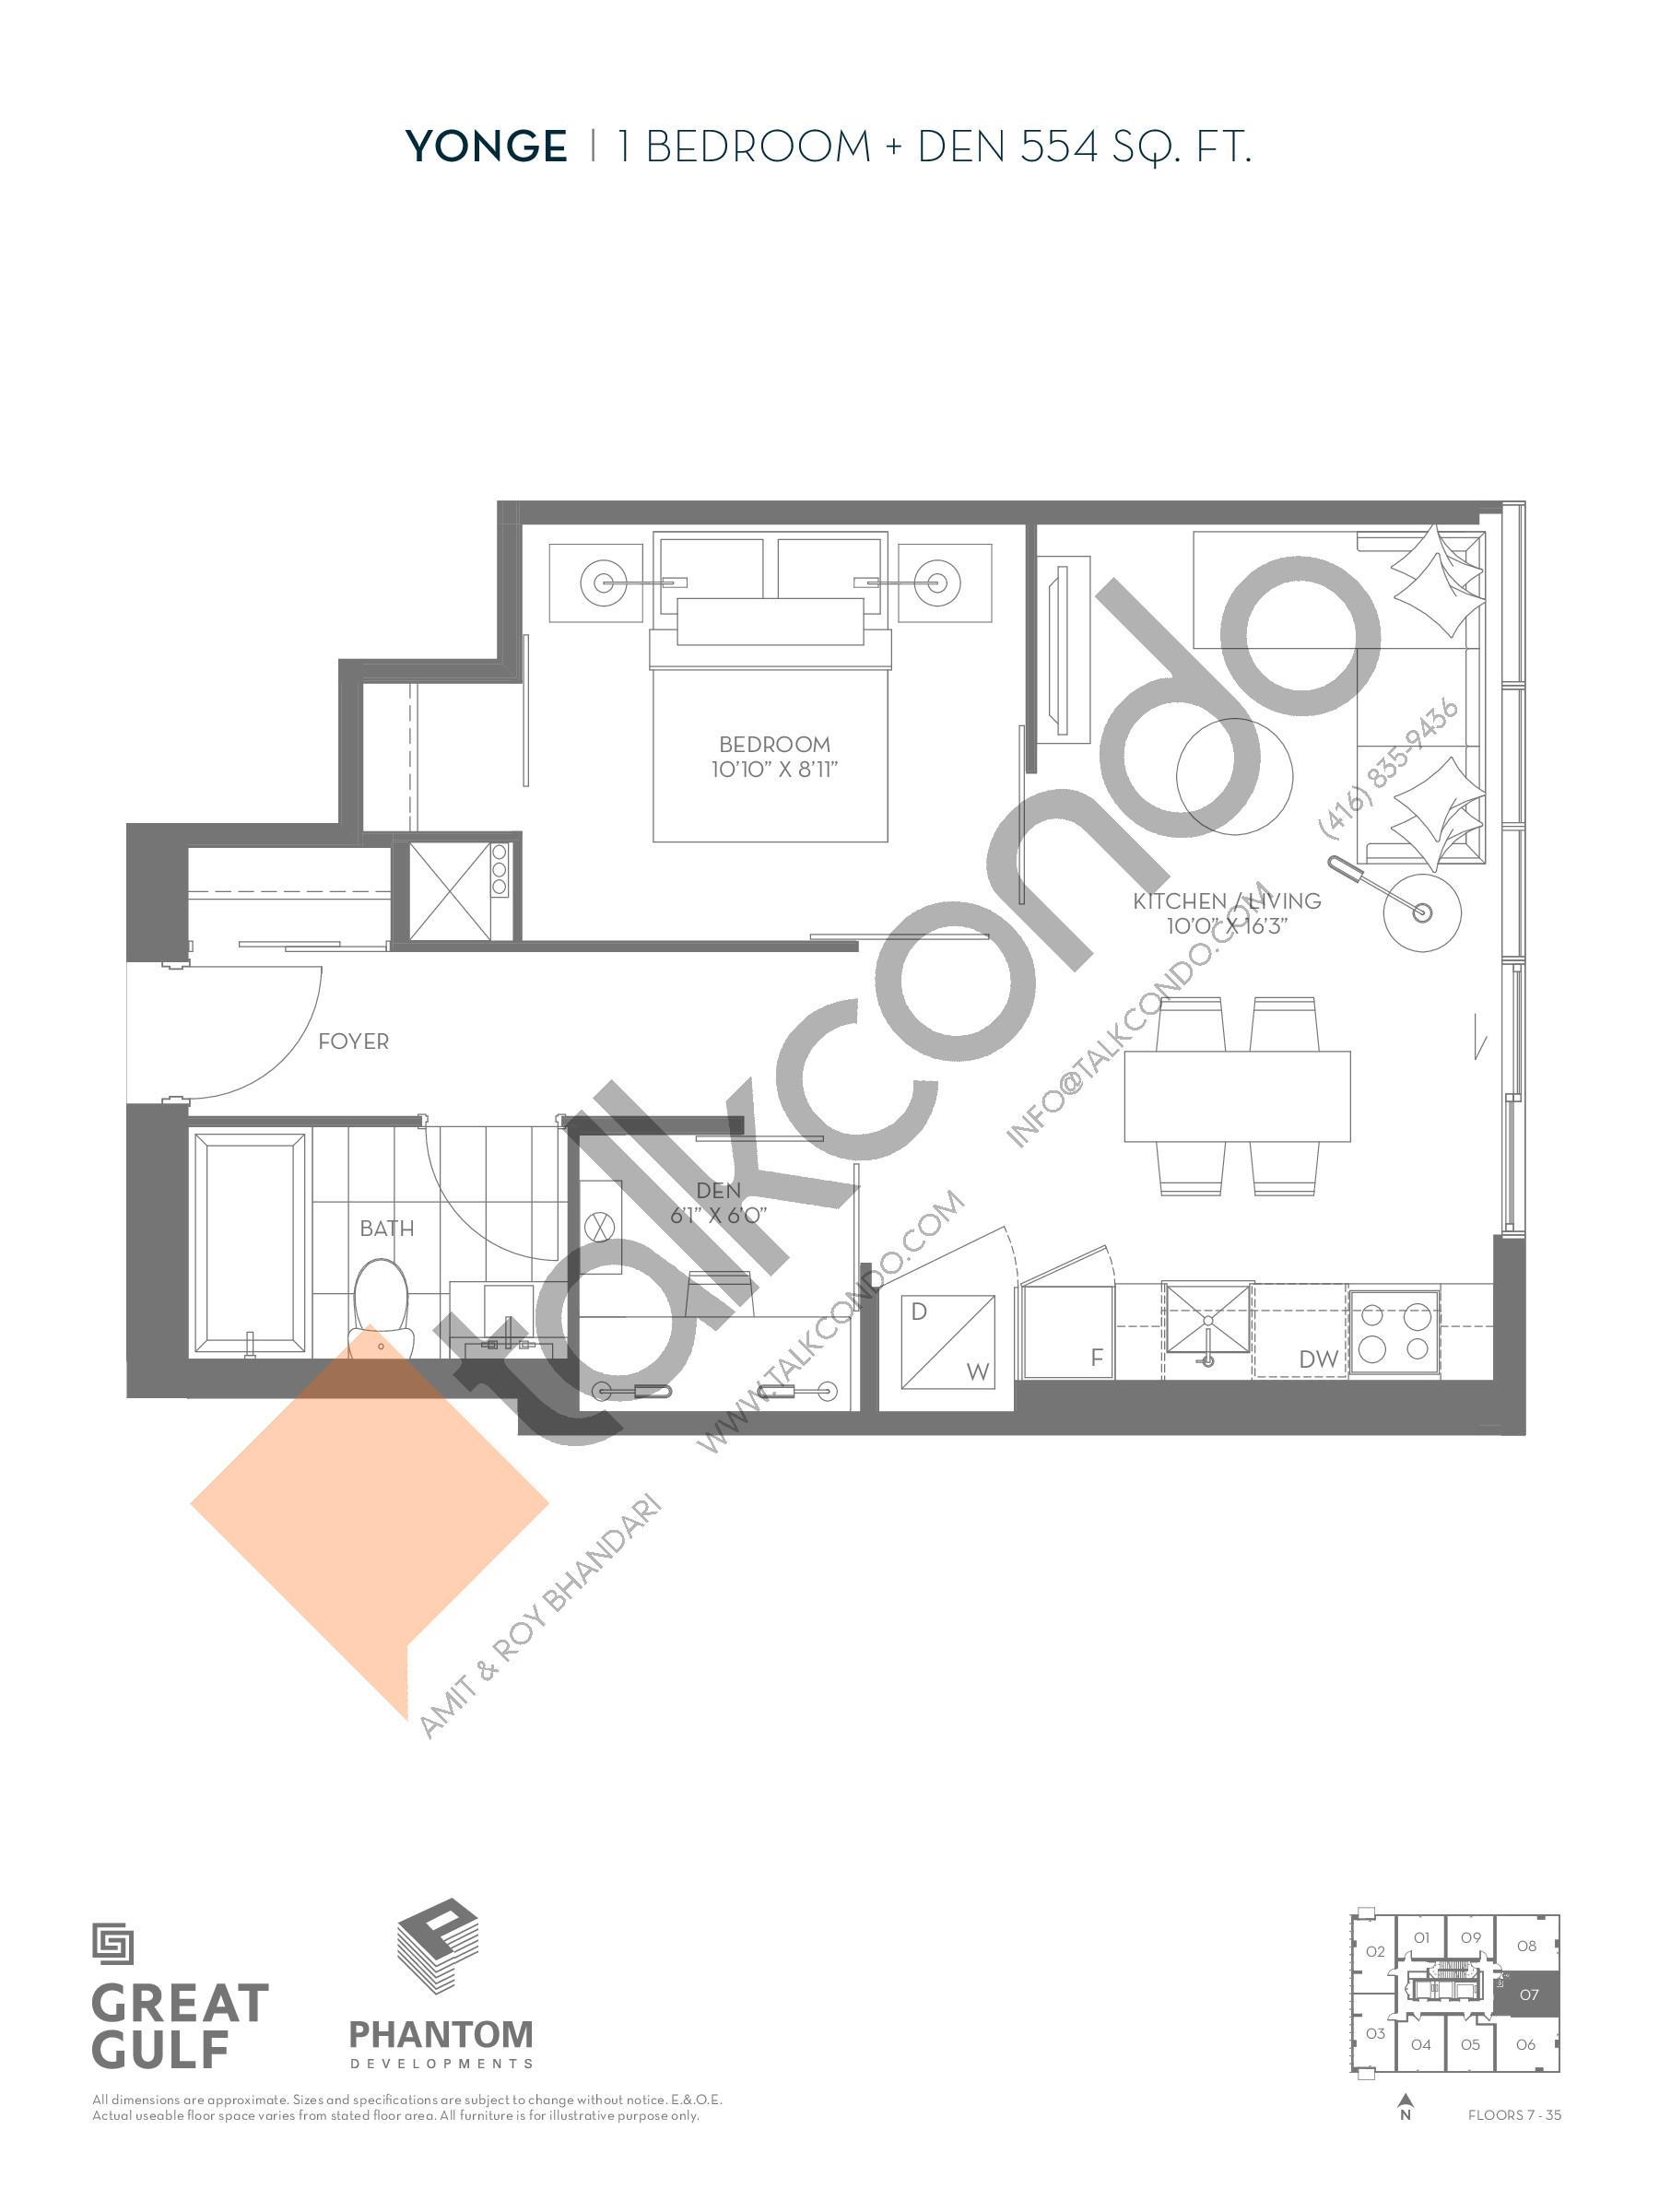 Yonge Floor Plan at 8 Cumberland Condos - 554 sq.ft